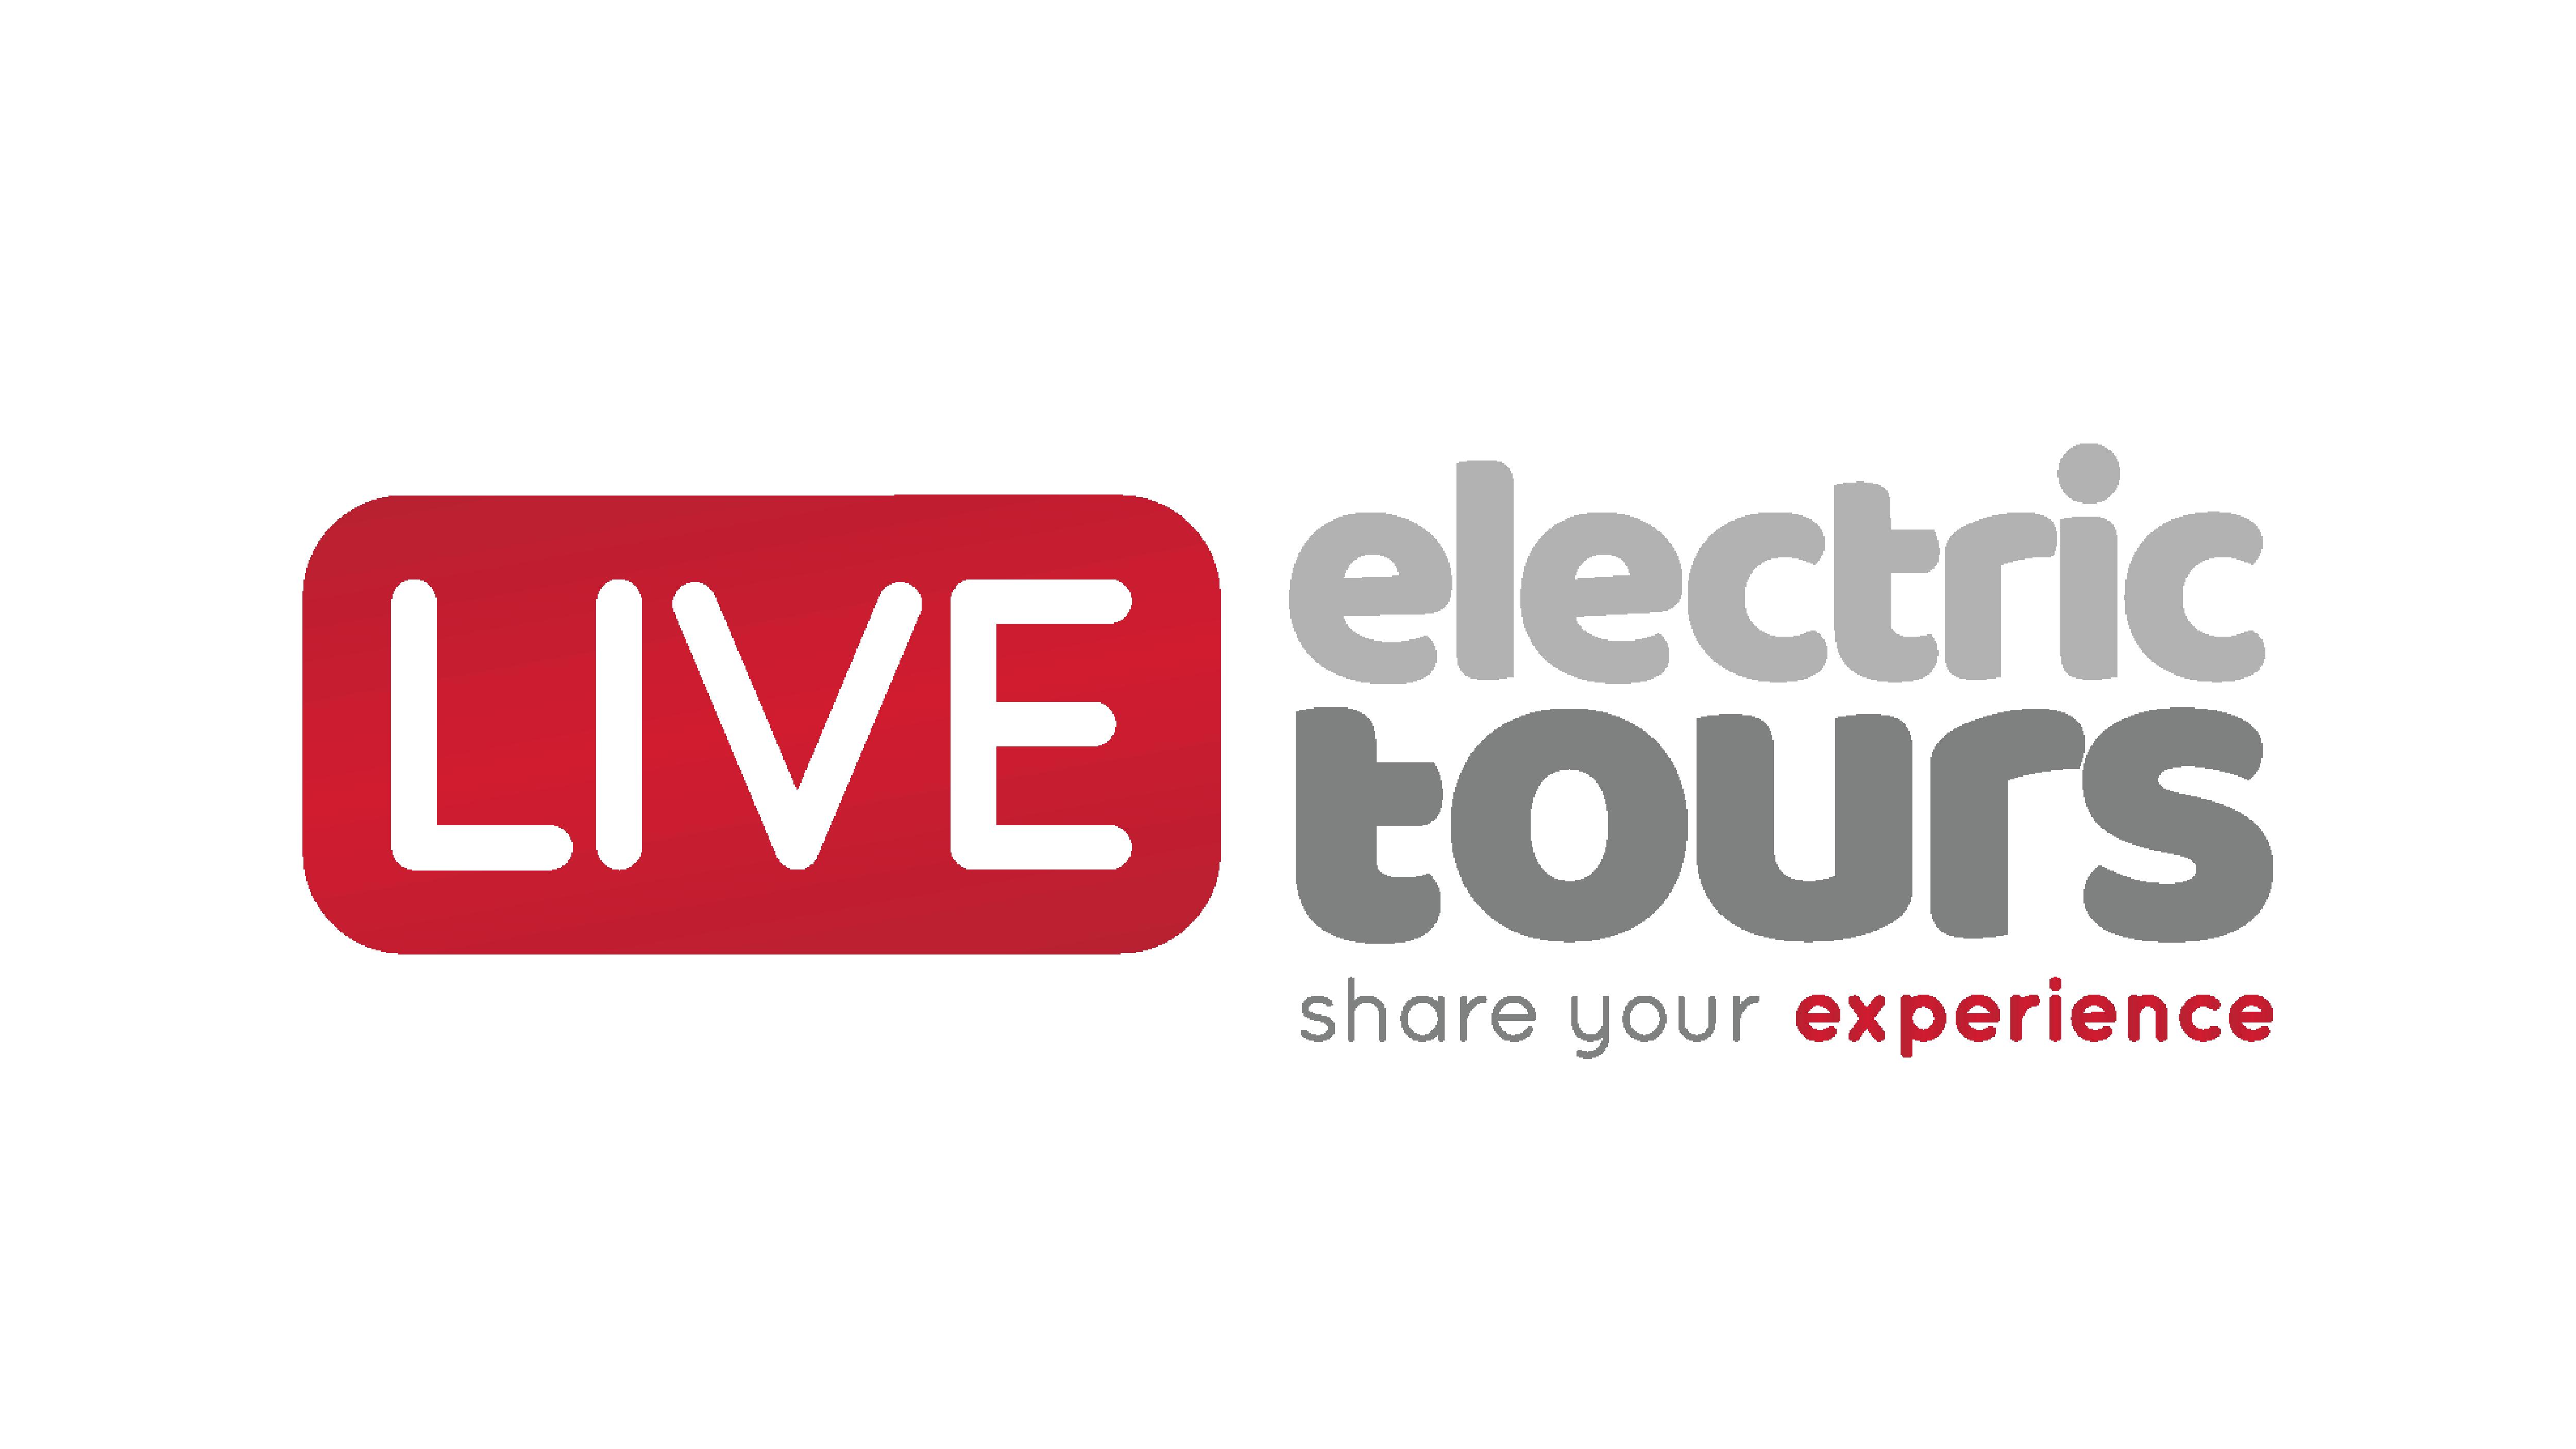 logo live electric tours